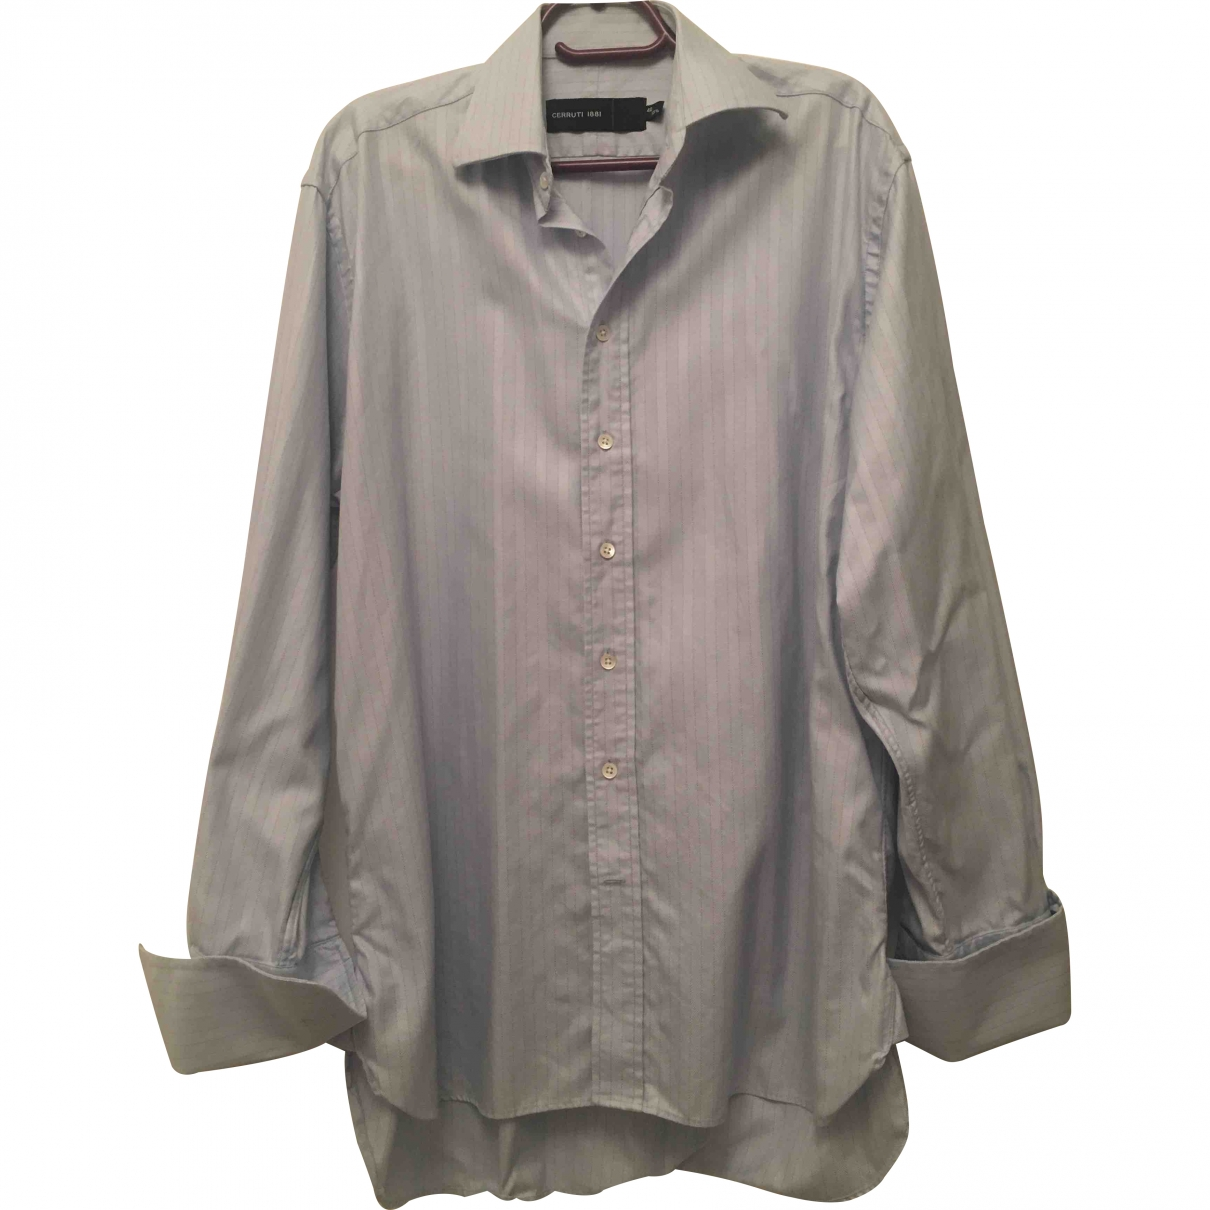 Cerruti \N Blue Cotton Shirts for Men 40 EU (tour de cou / collar)